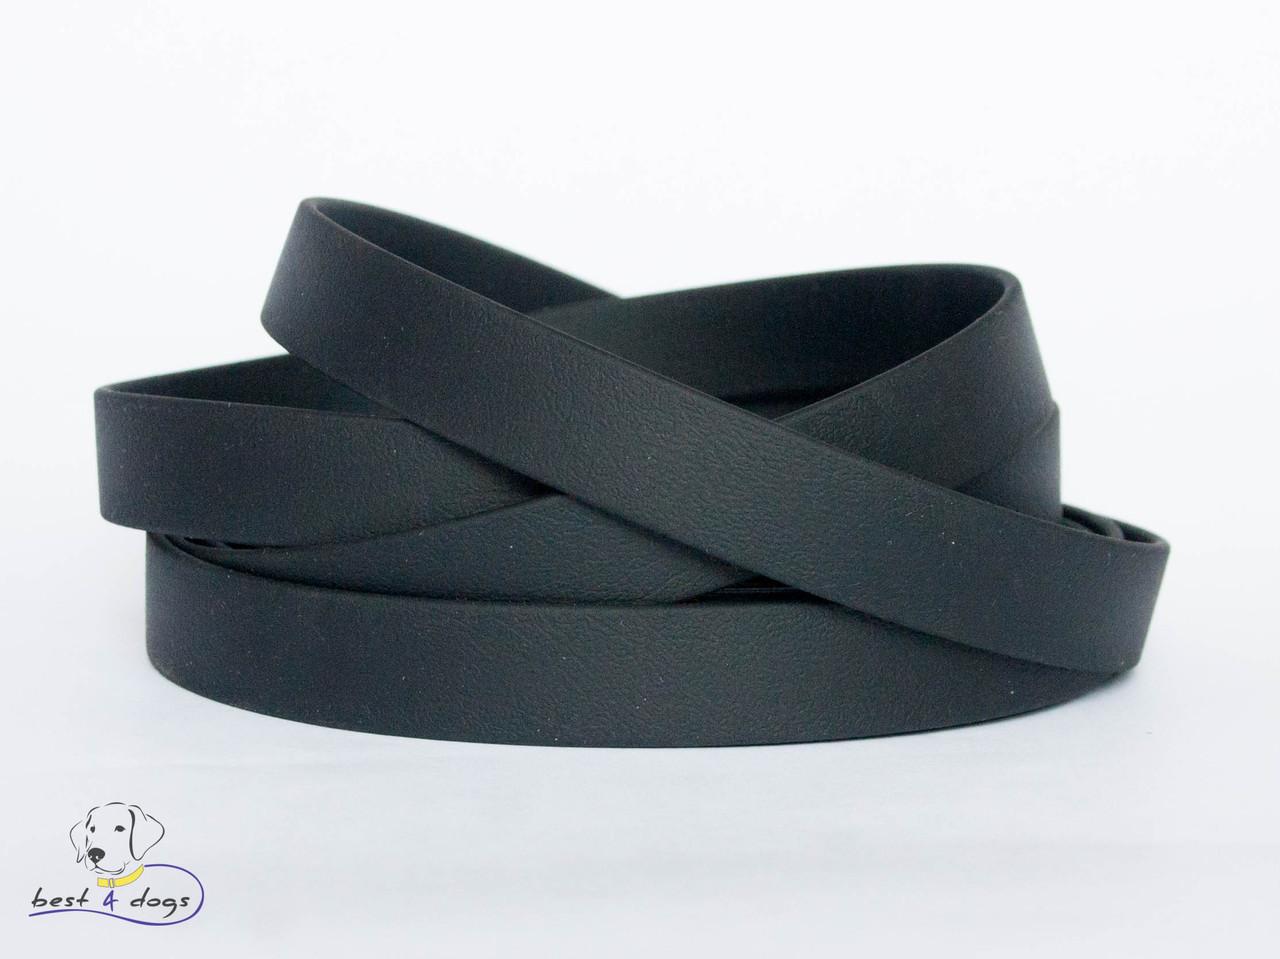 Ошейник из биотана, Черный, 19мм(пластик.фастекс)